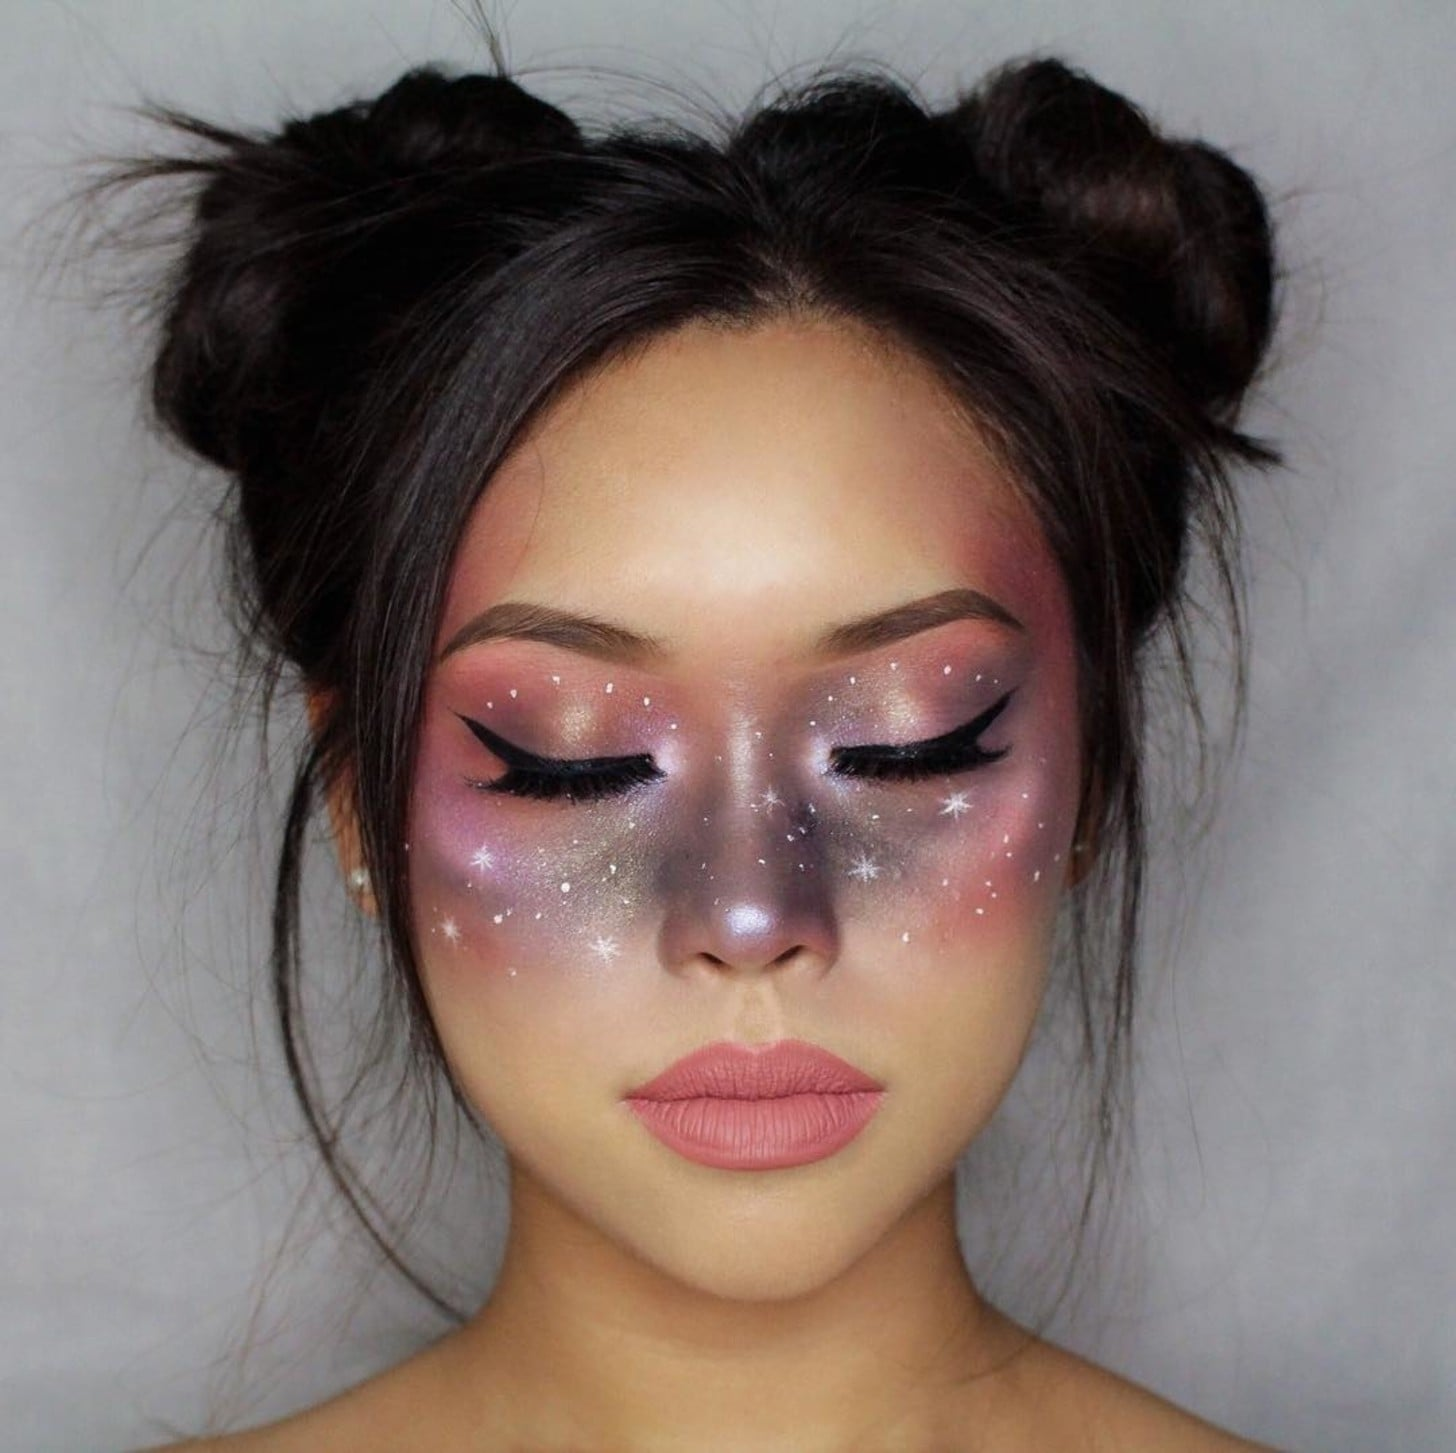 Celestial Makeup Ideas | POPSUGAR Beauty UK